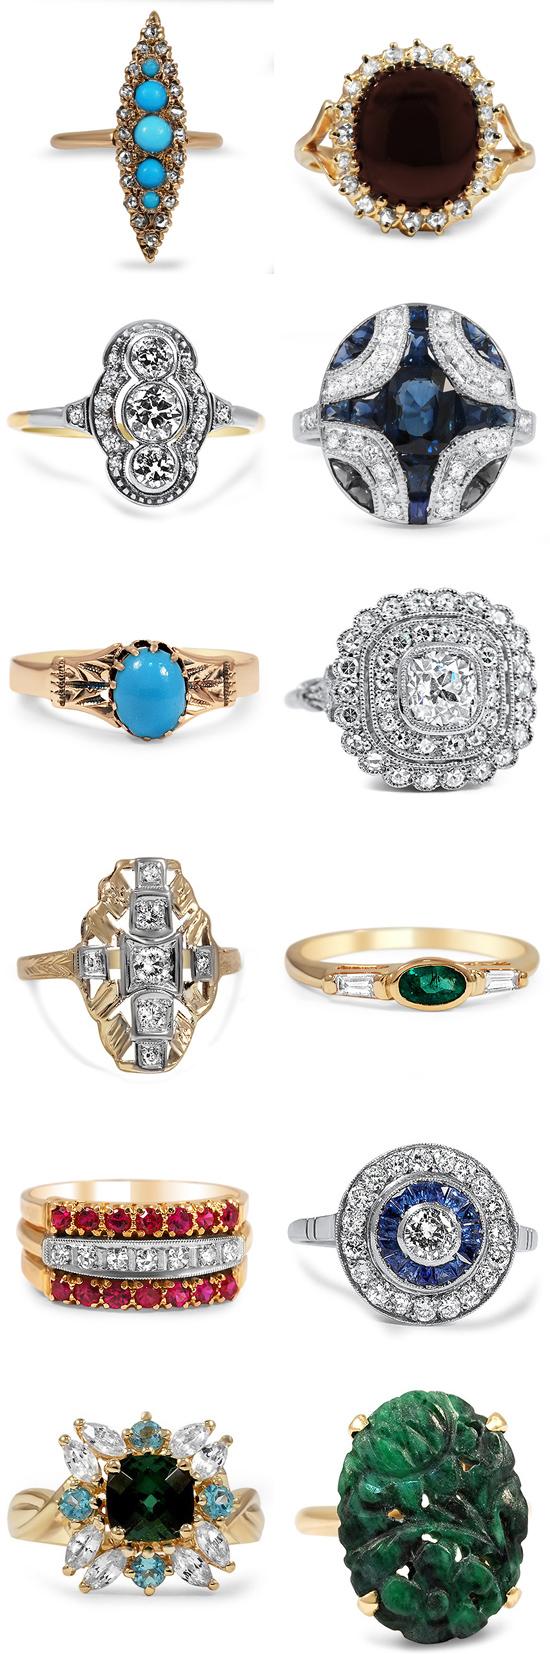 vintage engagement rings002